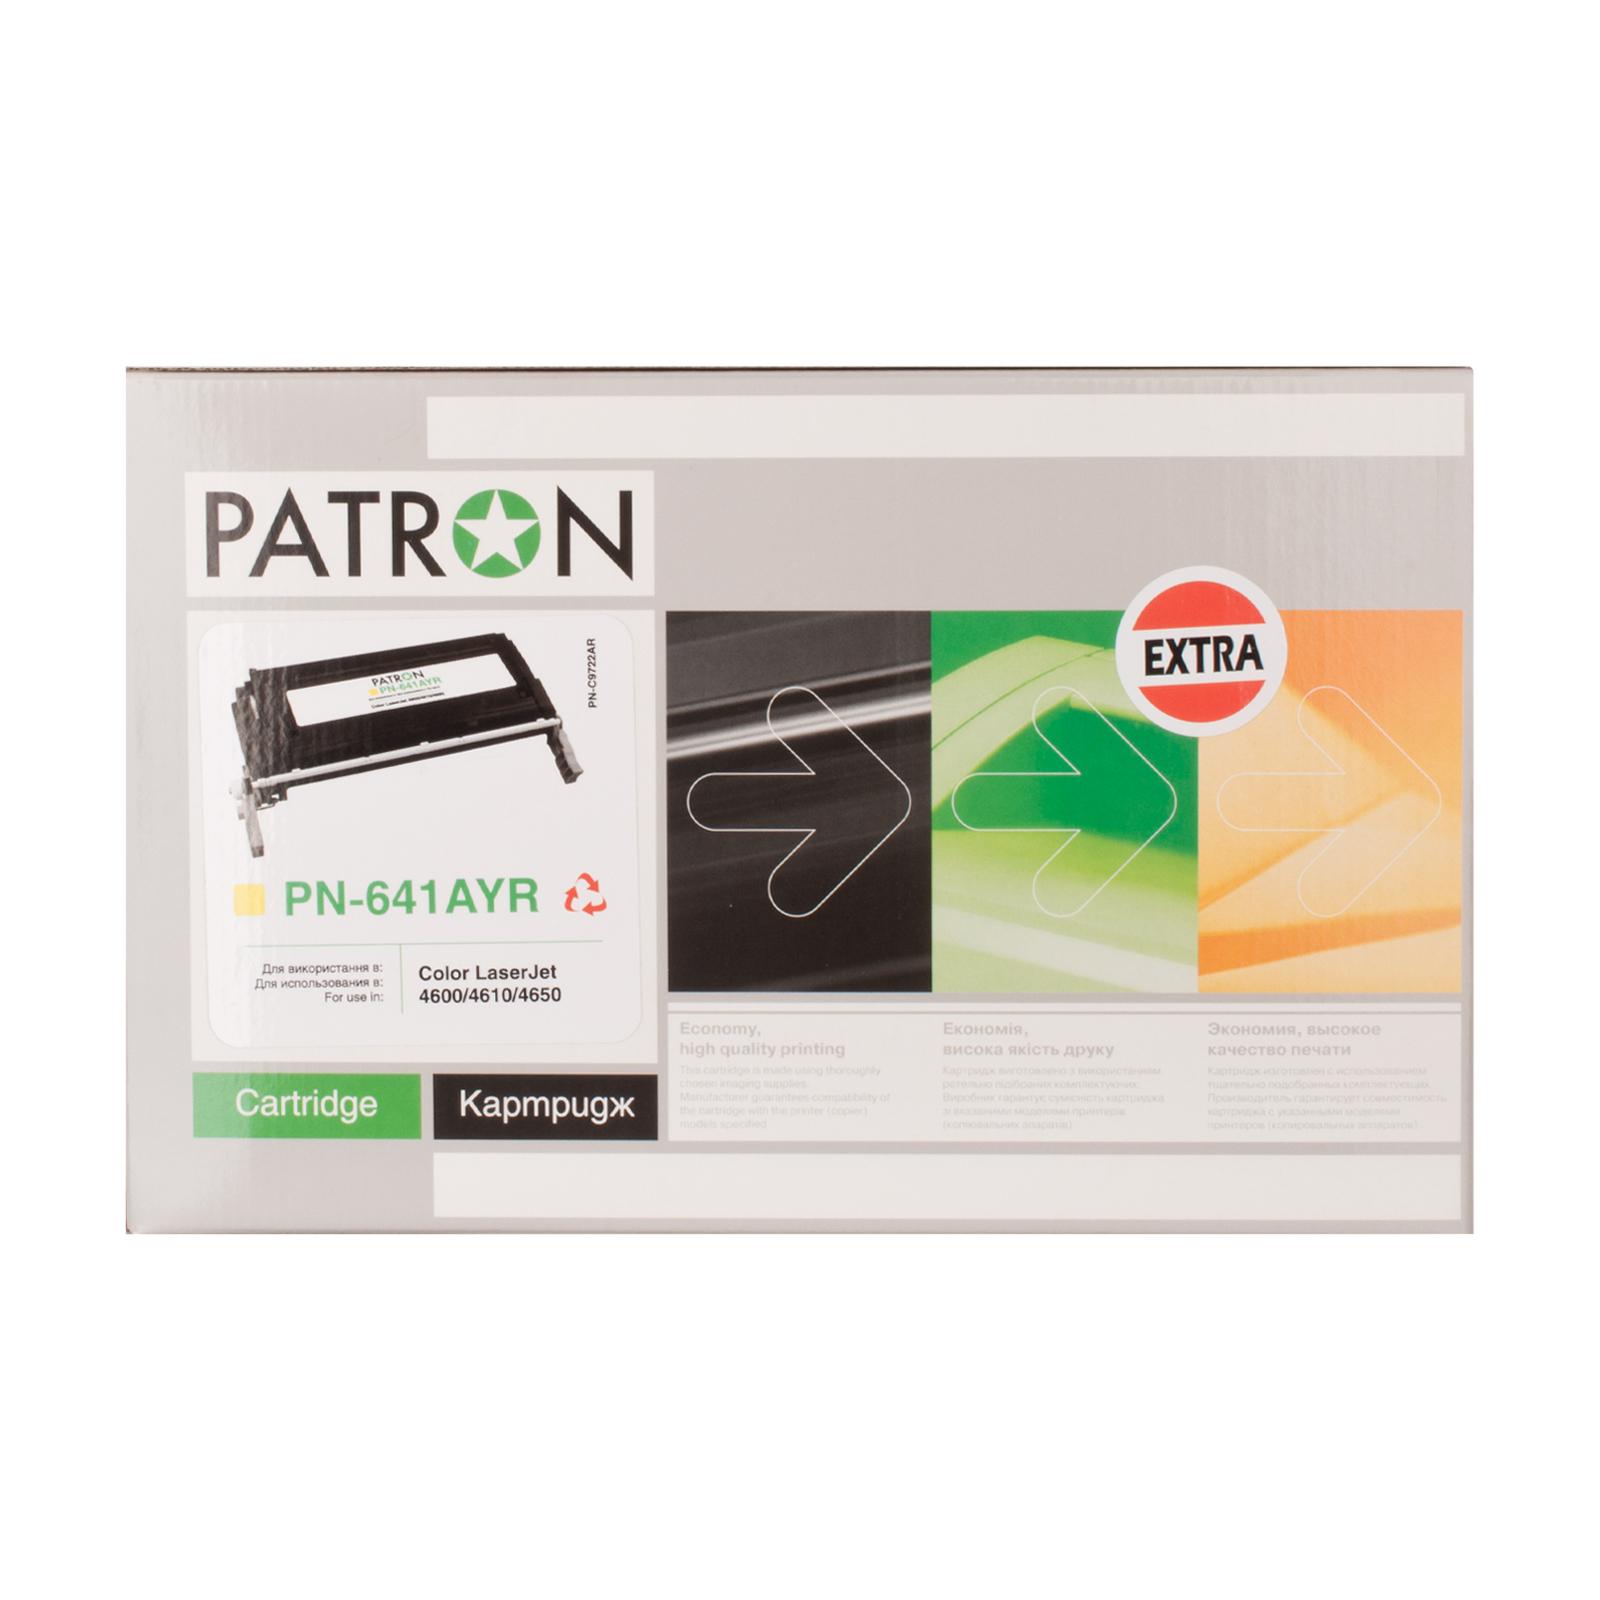 Картридж PATRON HP CLJ 4600 /C9722A (PN-641AYR) YELLOW Extra (CT-HP-C9722A-Y-PN-R) изображение 4